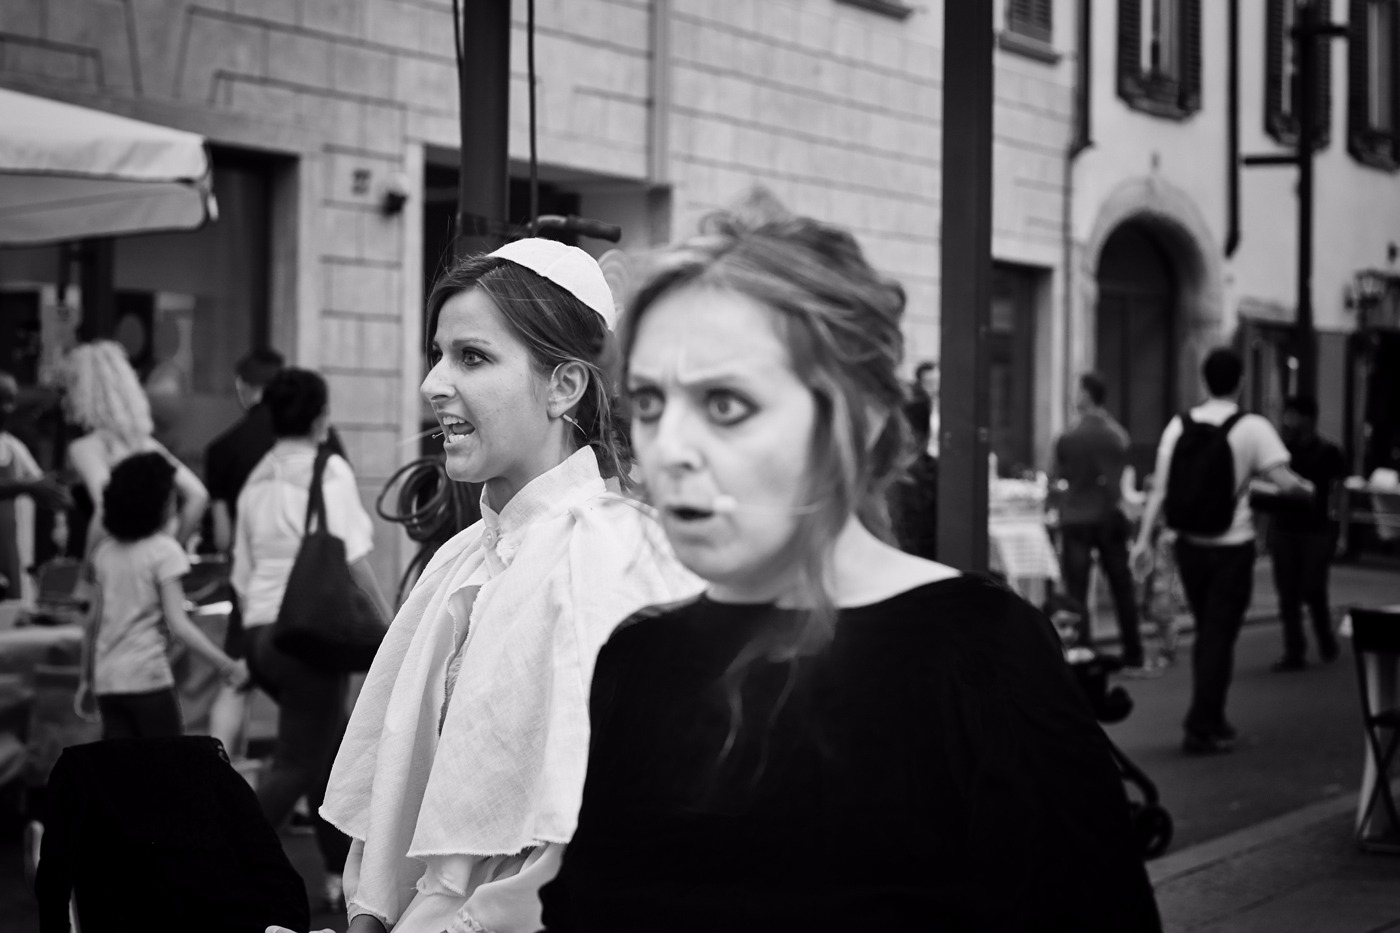 Bergamo Buskers Festival 2016